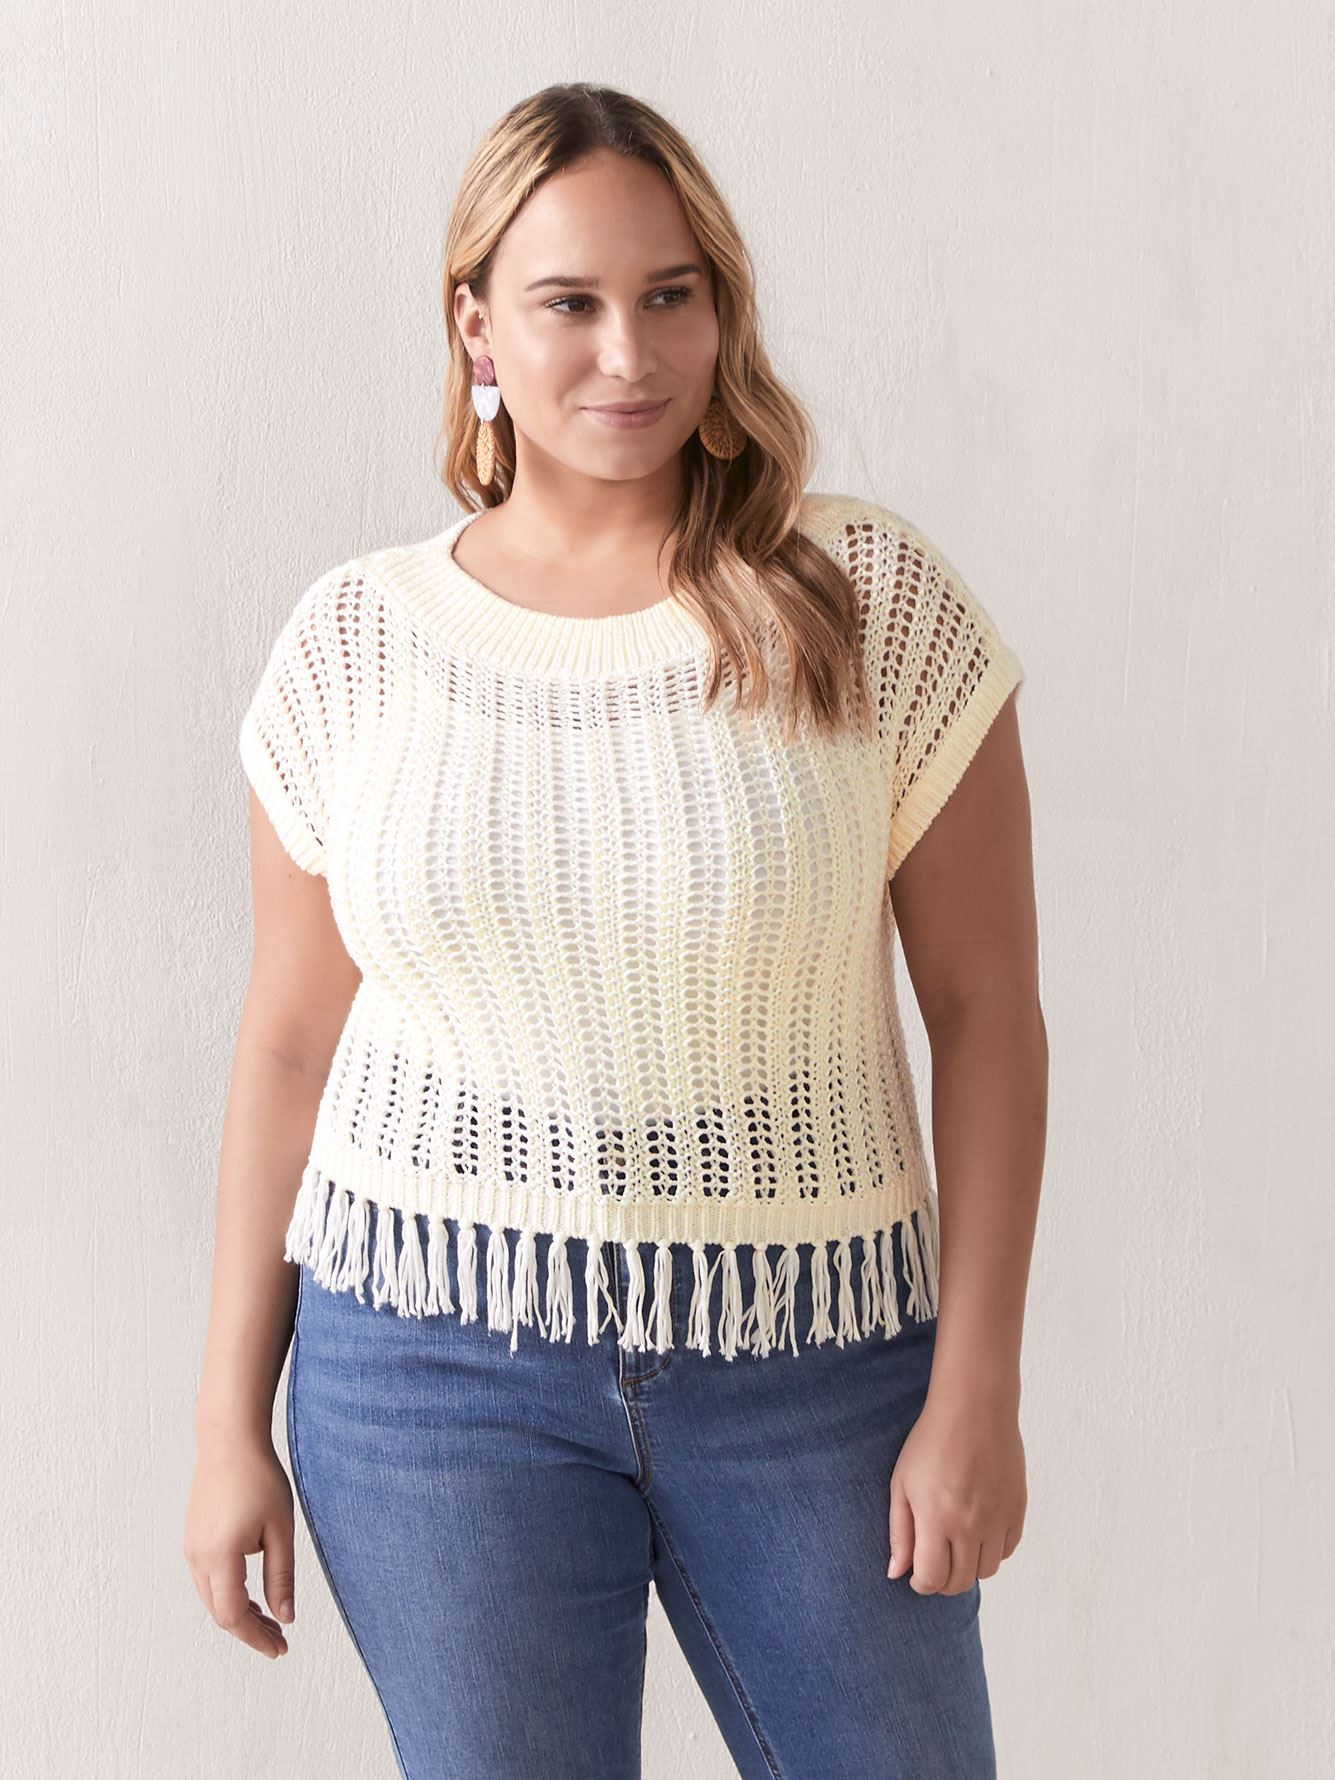 Crochet Sweater with Fringed Hem - Addition Elle 2